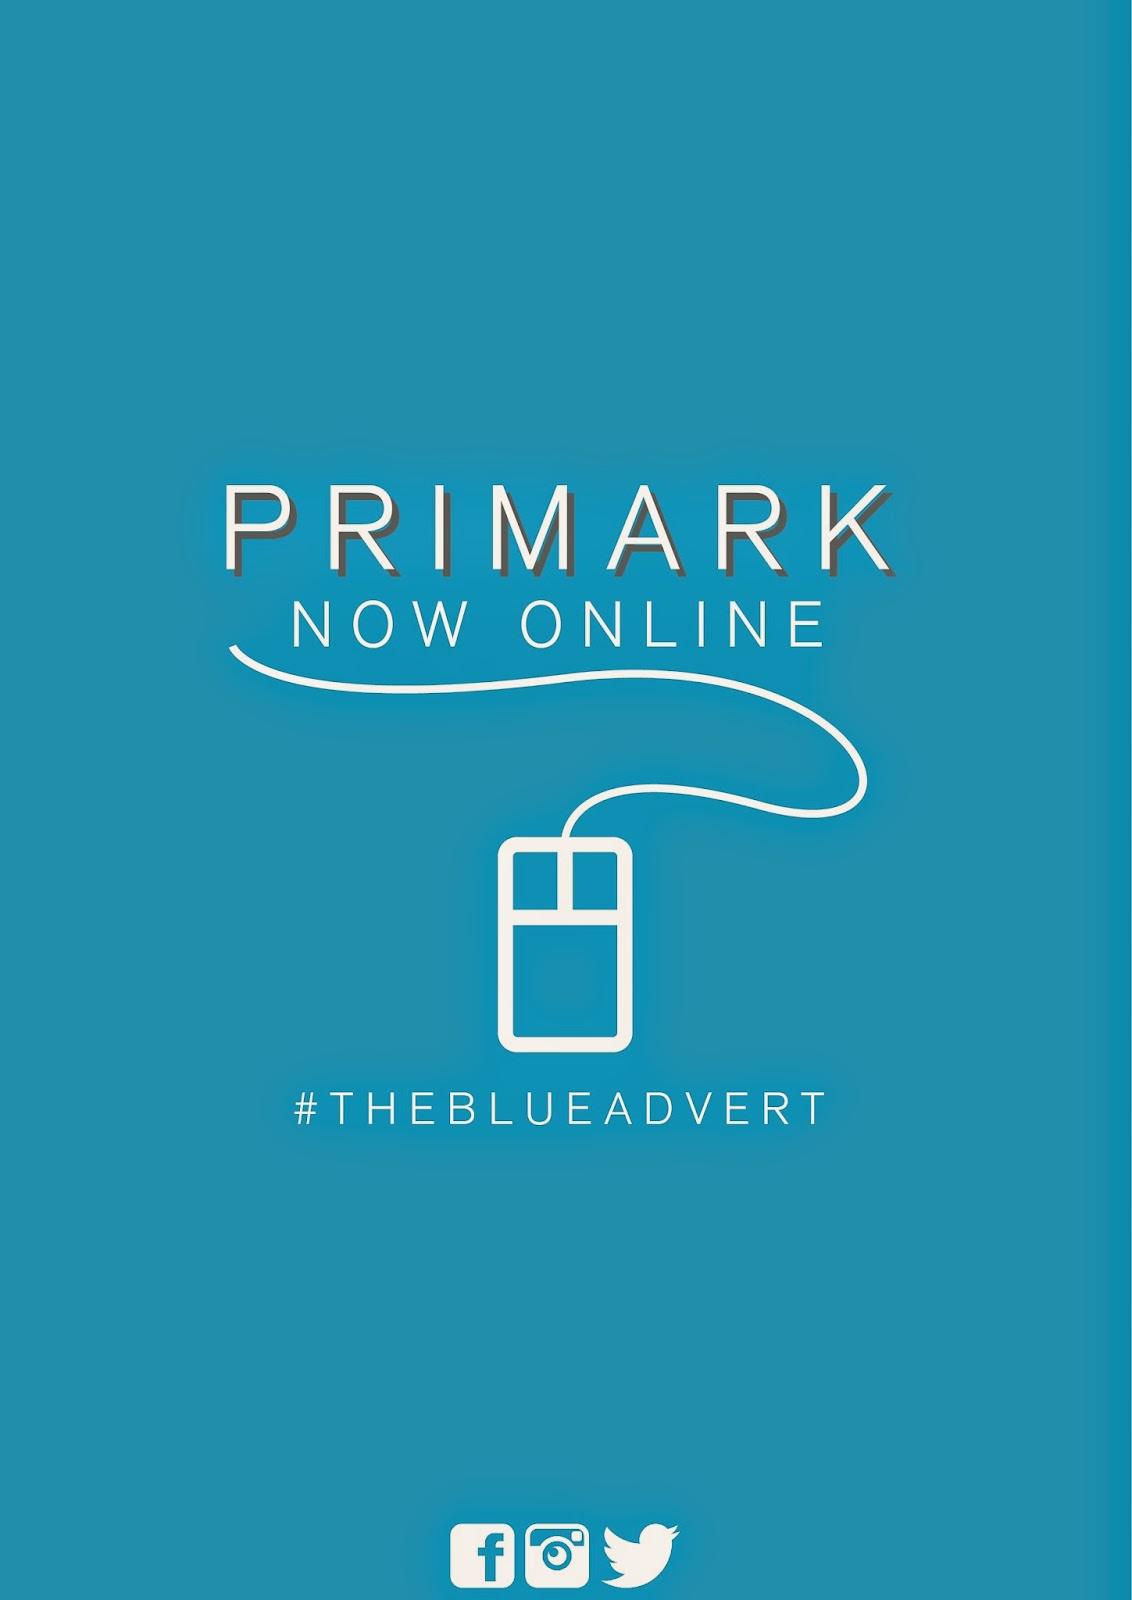 Primark Strategic Marketing Audit Essay